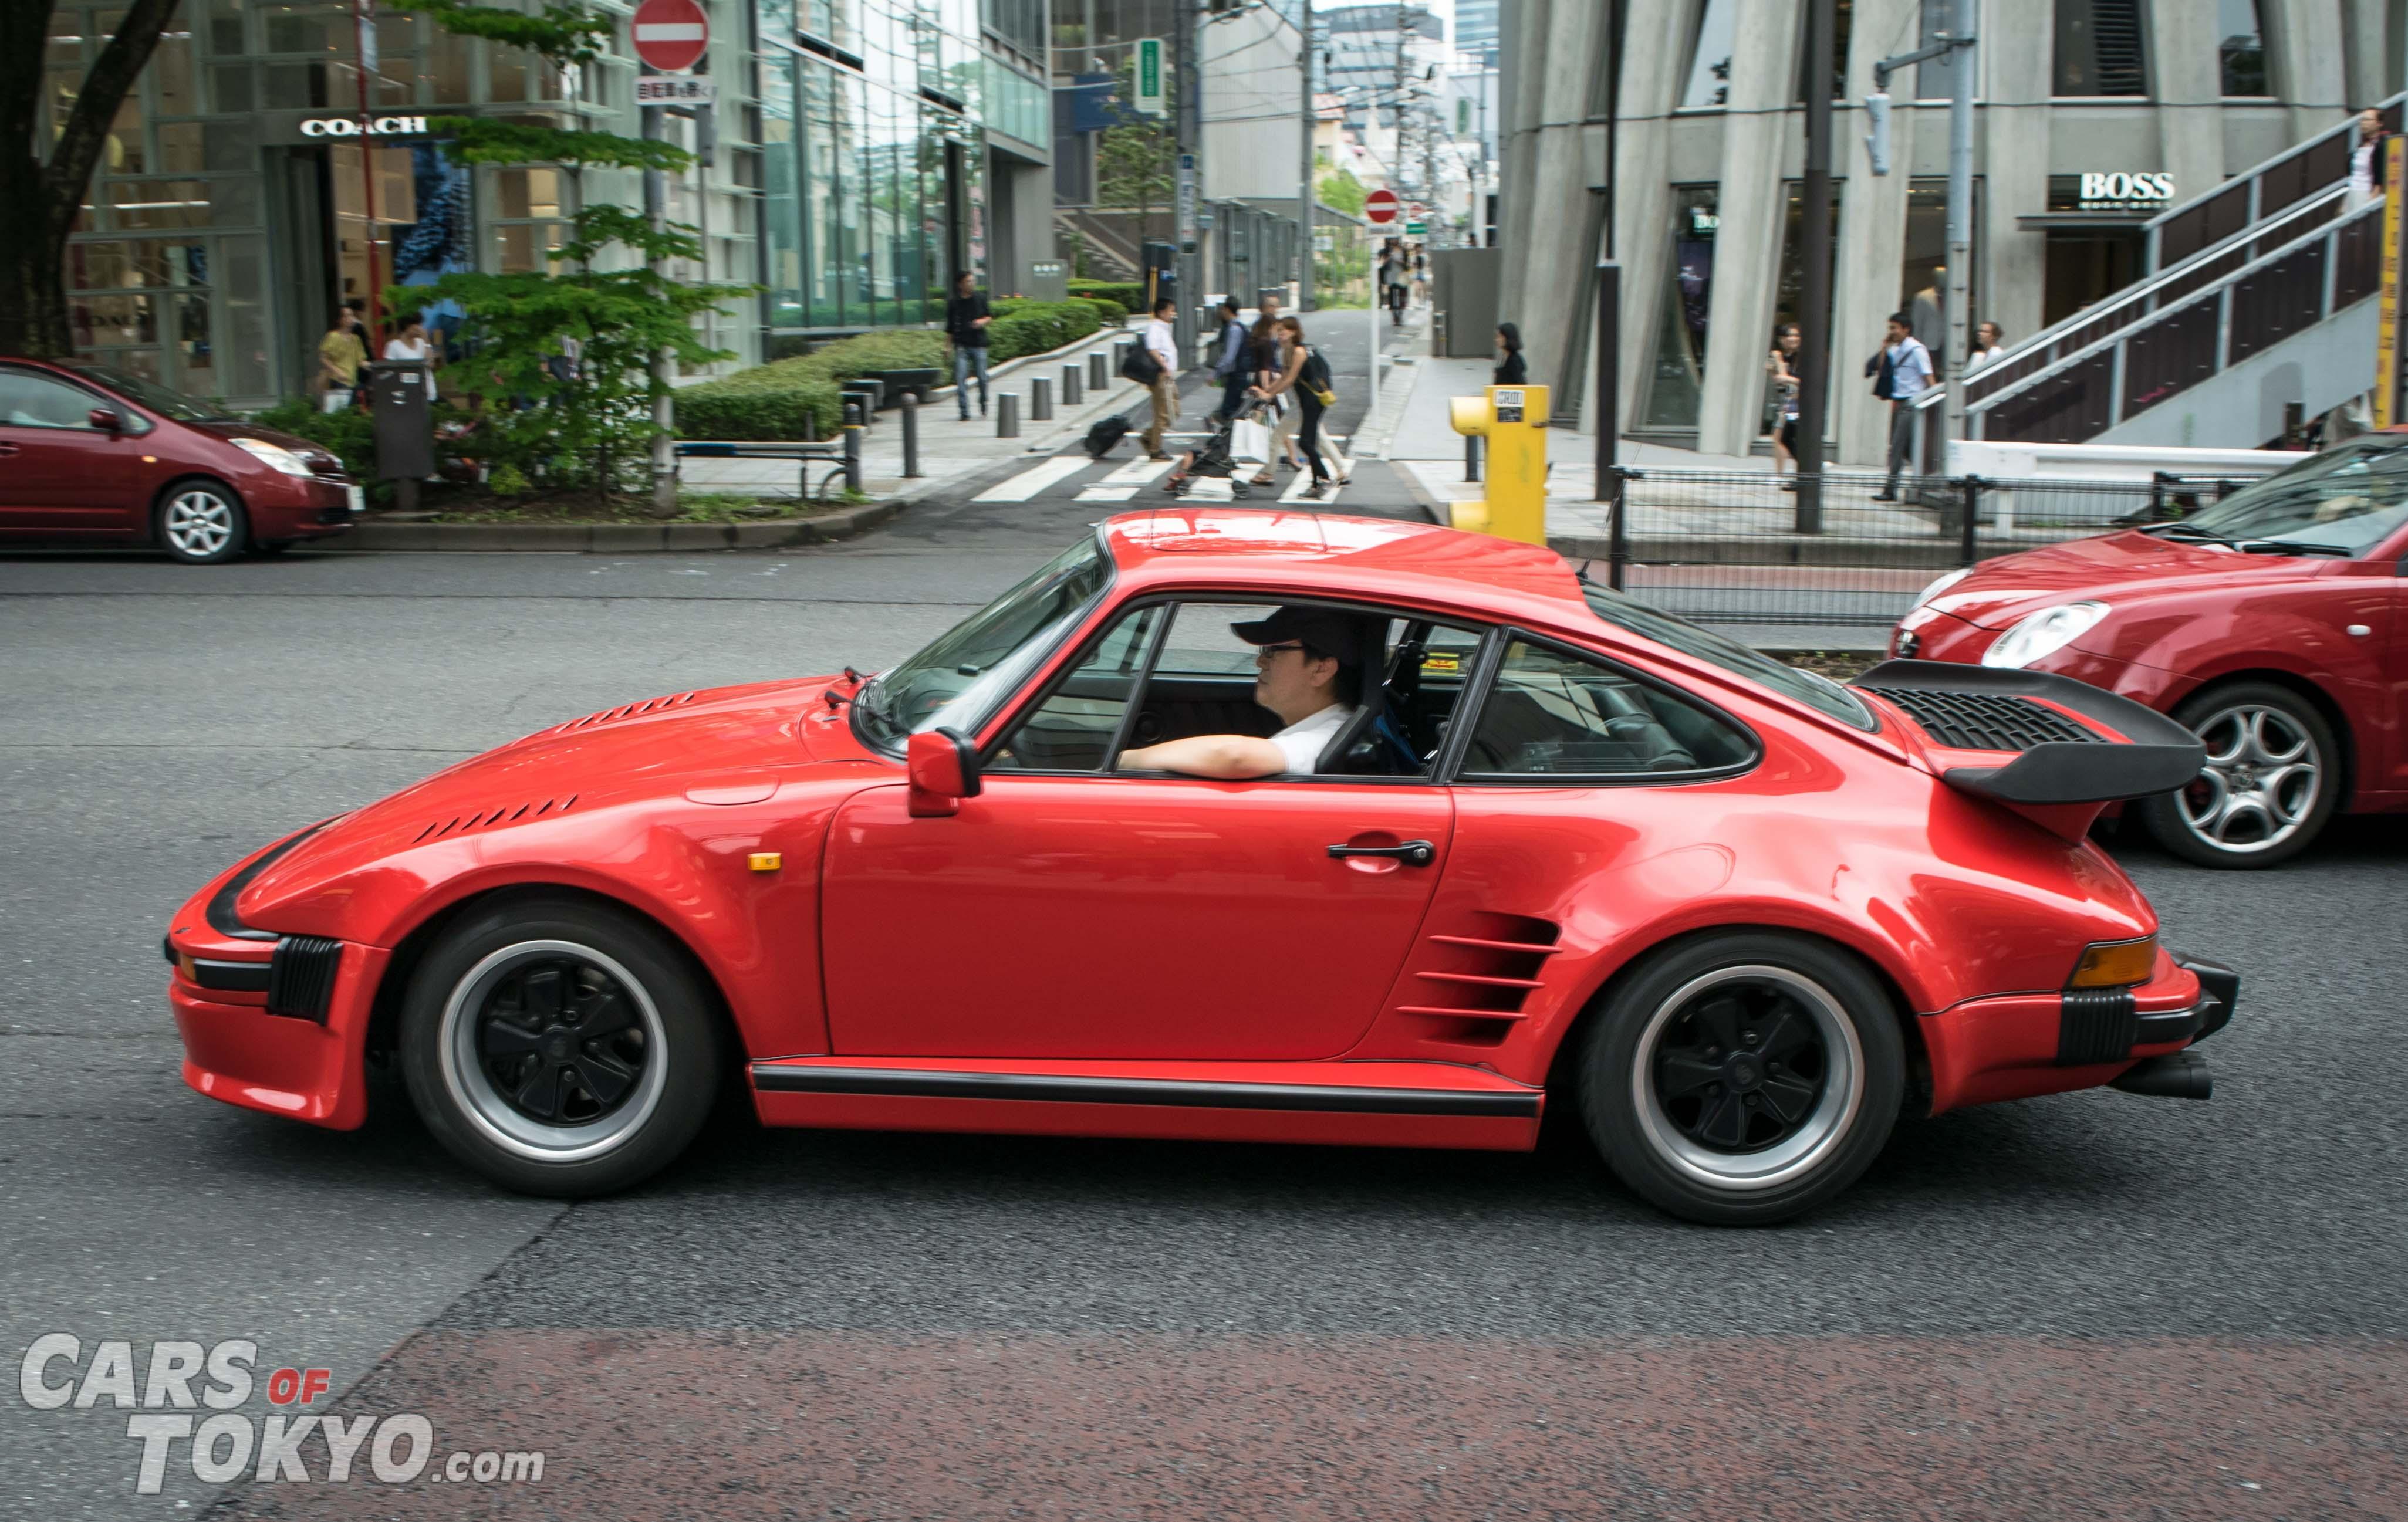 Cars of Tokyo Classic Porsche 911 Flatnose